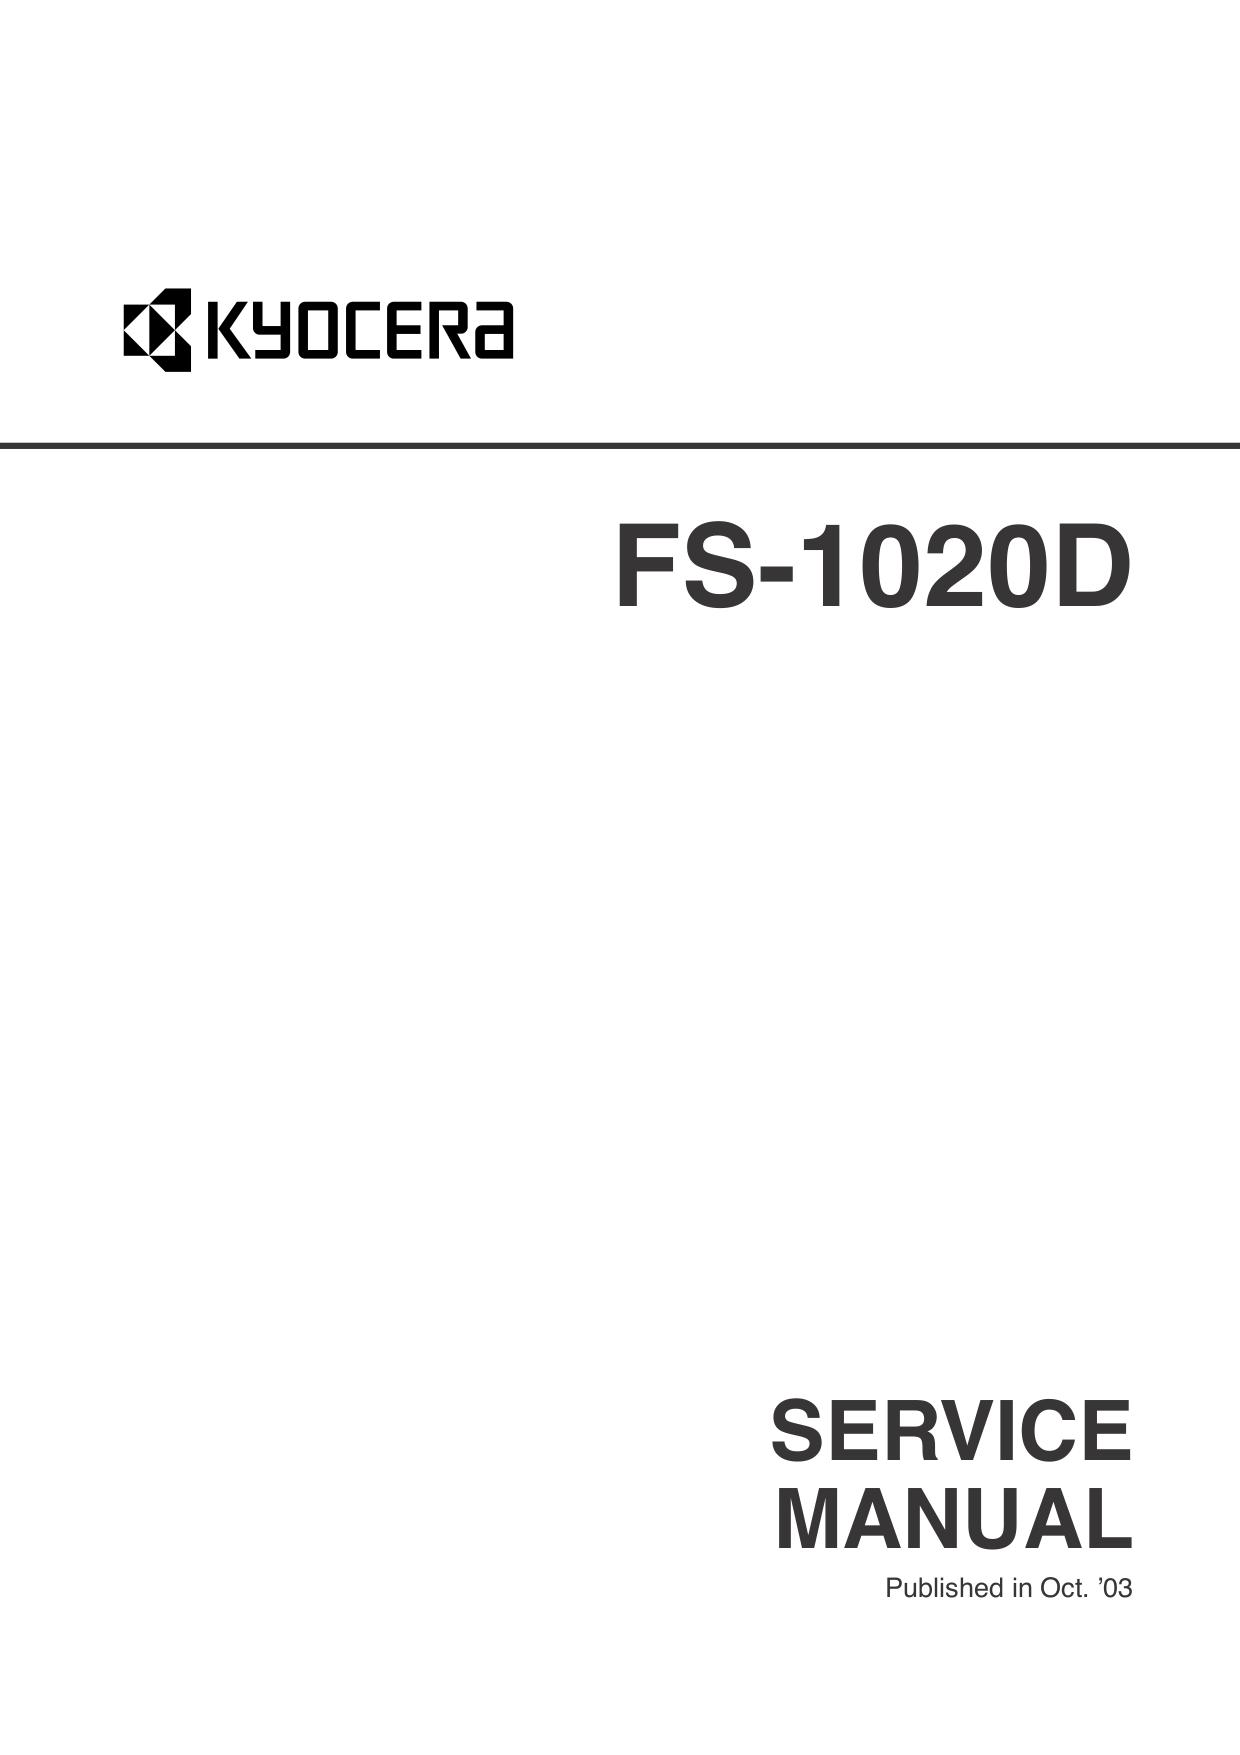 Download free pdf for Kyocera FS-1020D Printer manual